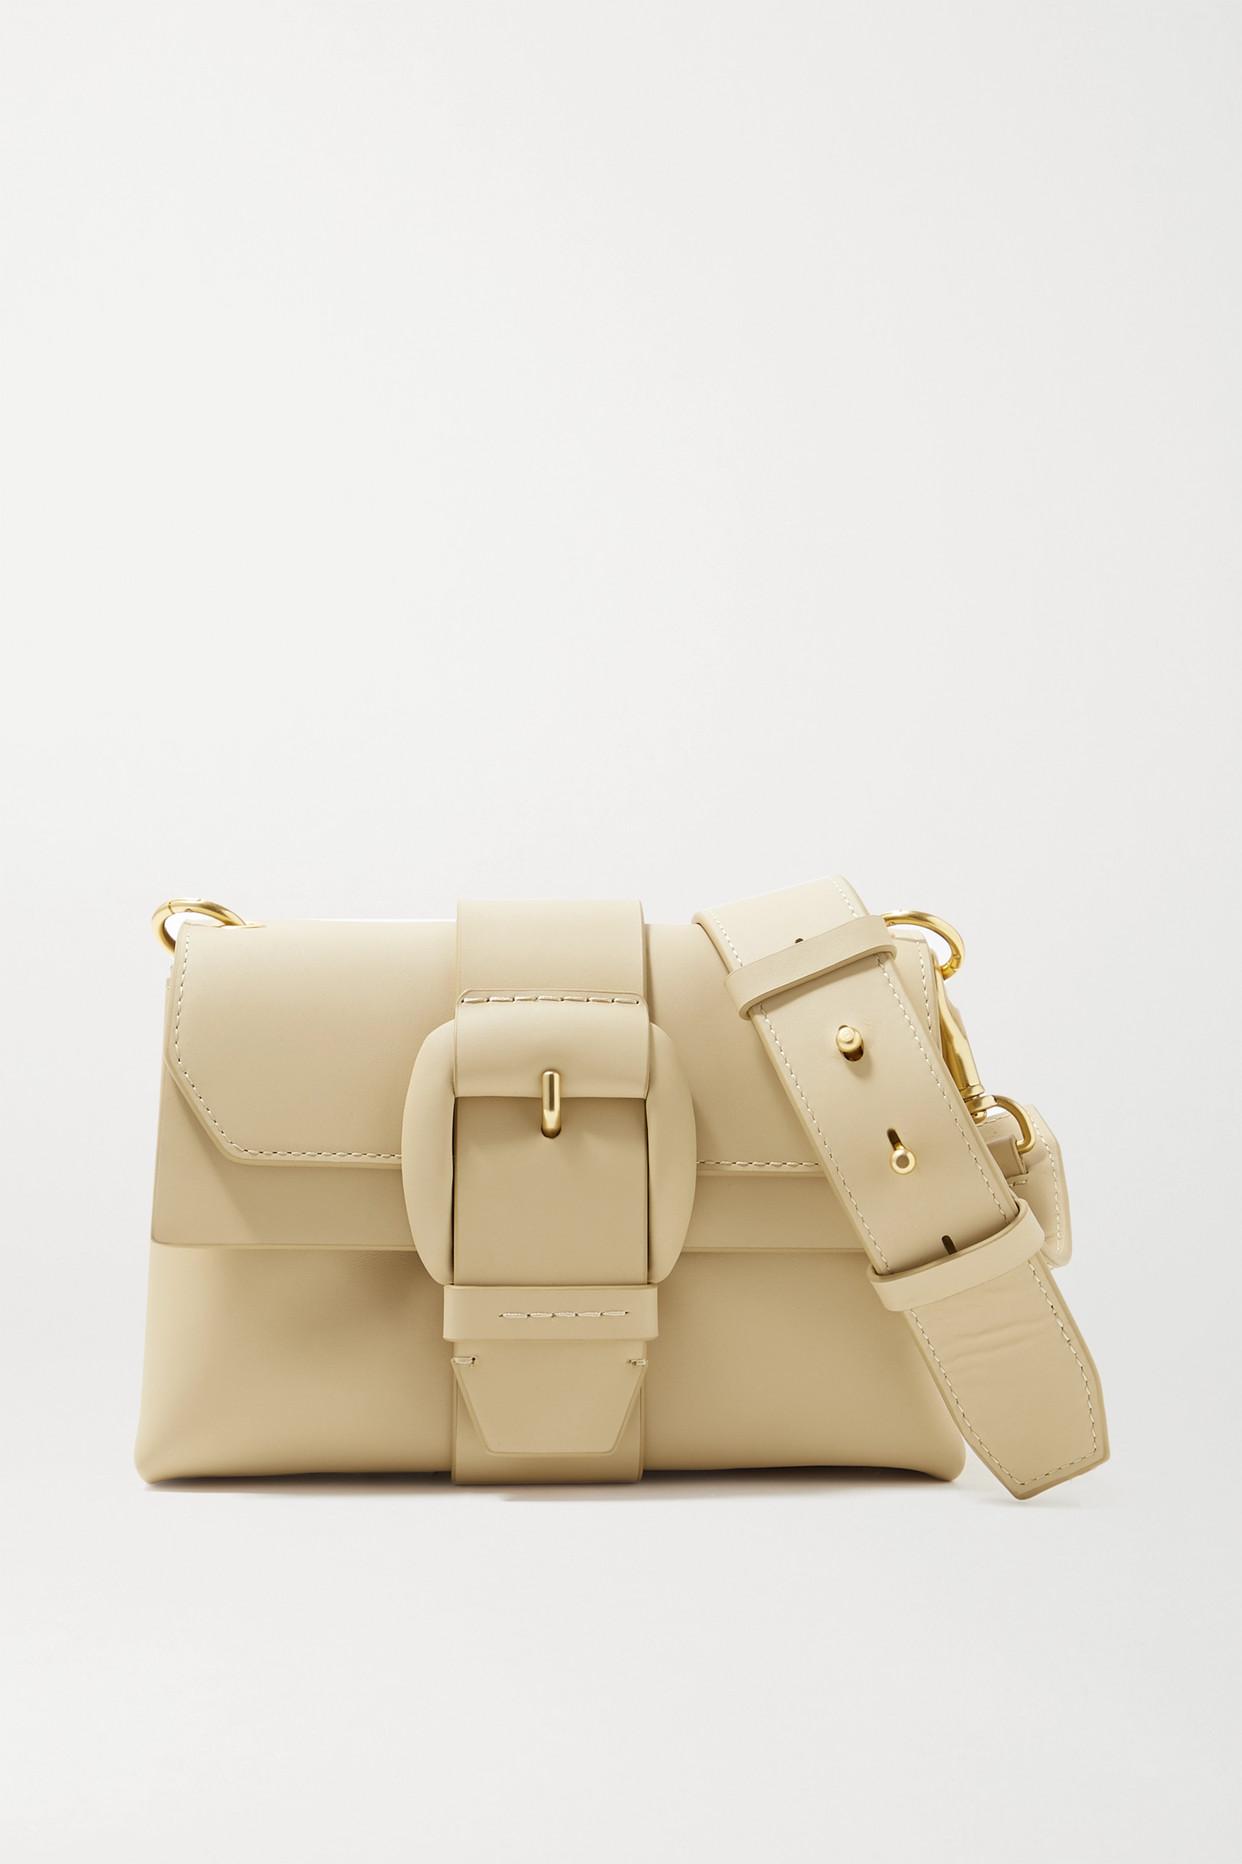 OROTON - Frida Mini Leather Shoulder Bag - Neutrals - one size